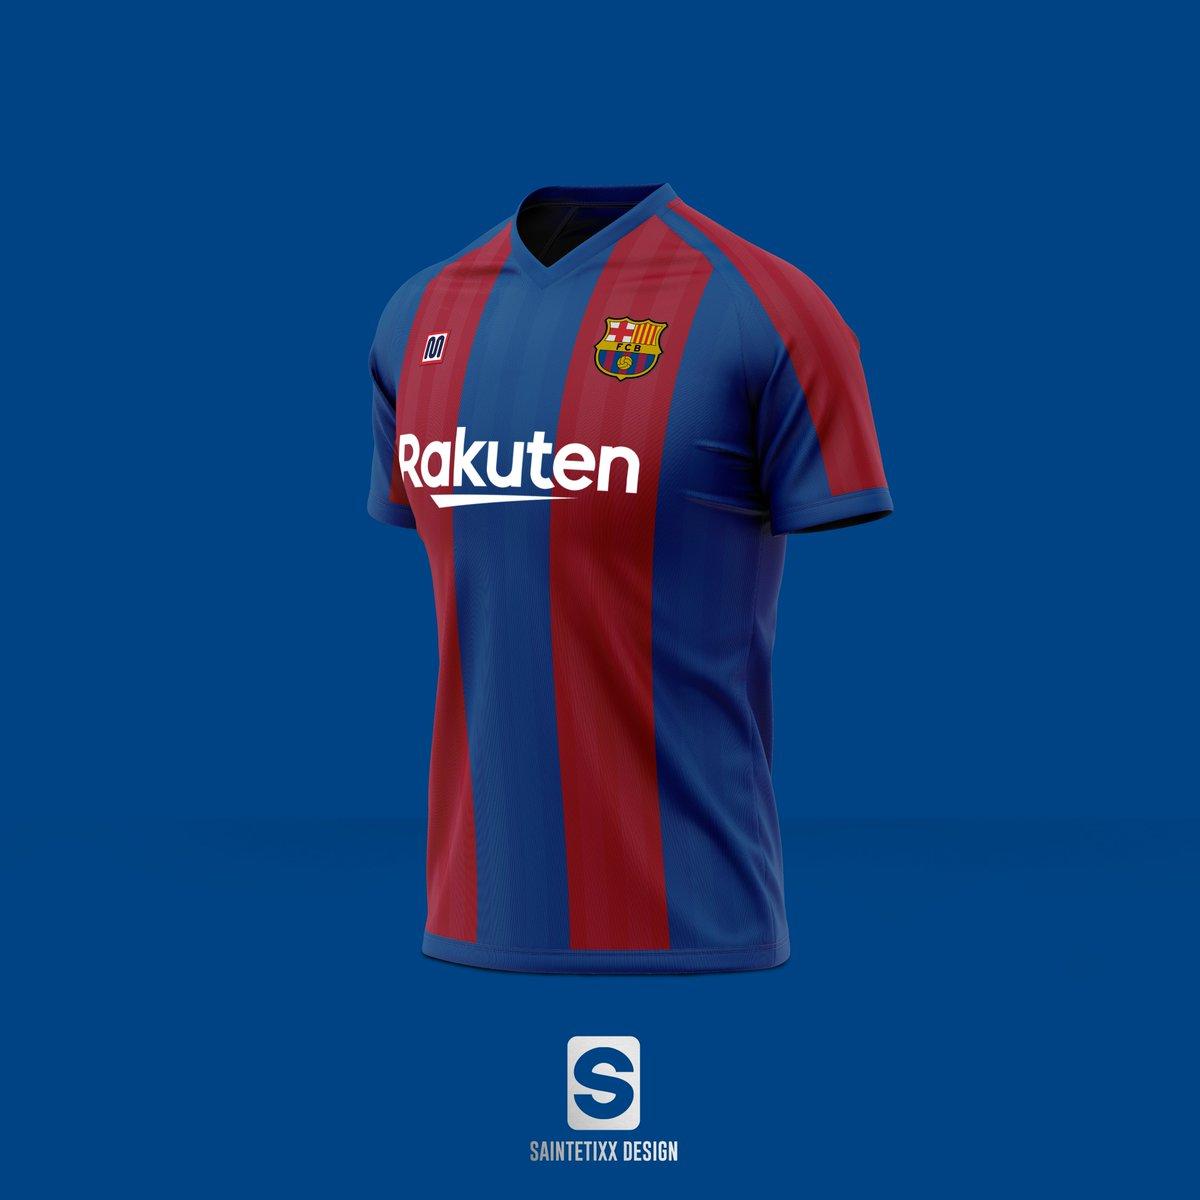 FC Barcelona x Meyba - Concepts kits . #Barca #Barcelona #BarcelonaFC #FCBarcelona #FCBarcelone #MeybaReturnpic.twitter.com/3W7l20lckW